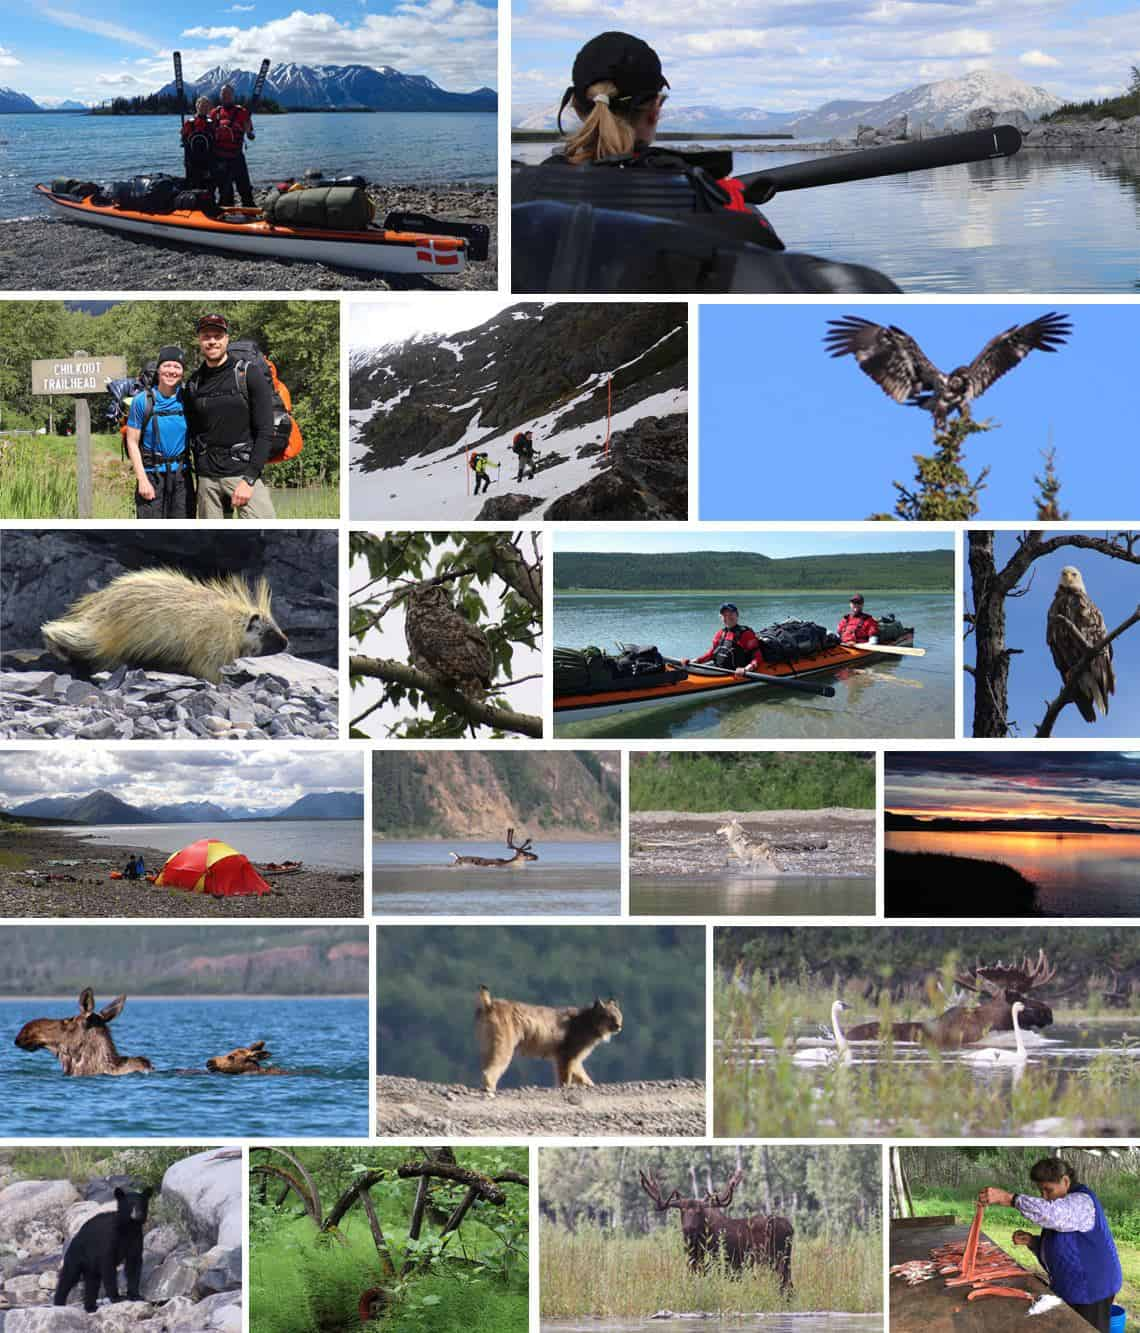 Udvalgtebilleder Yukon River